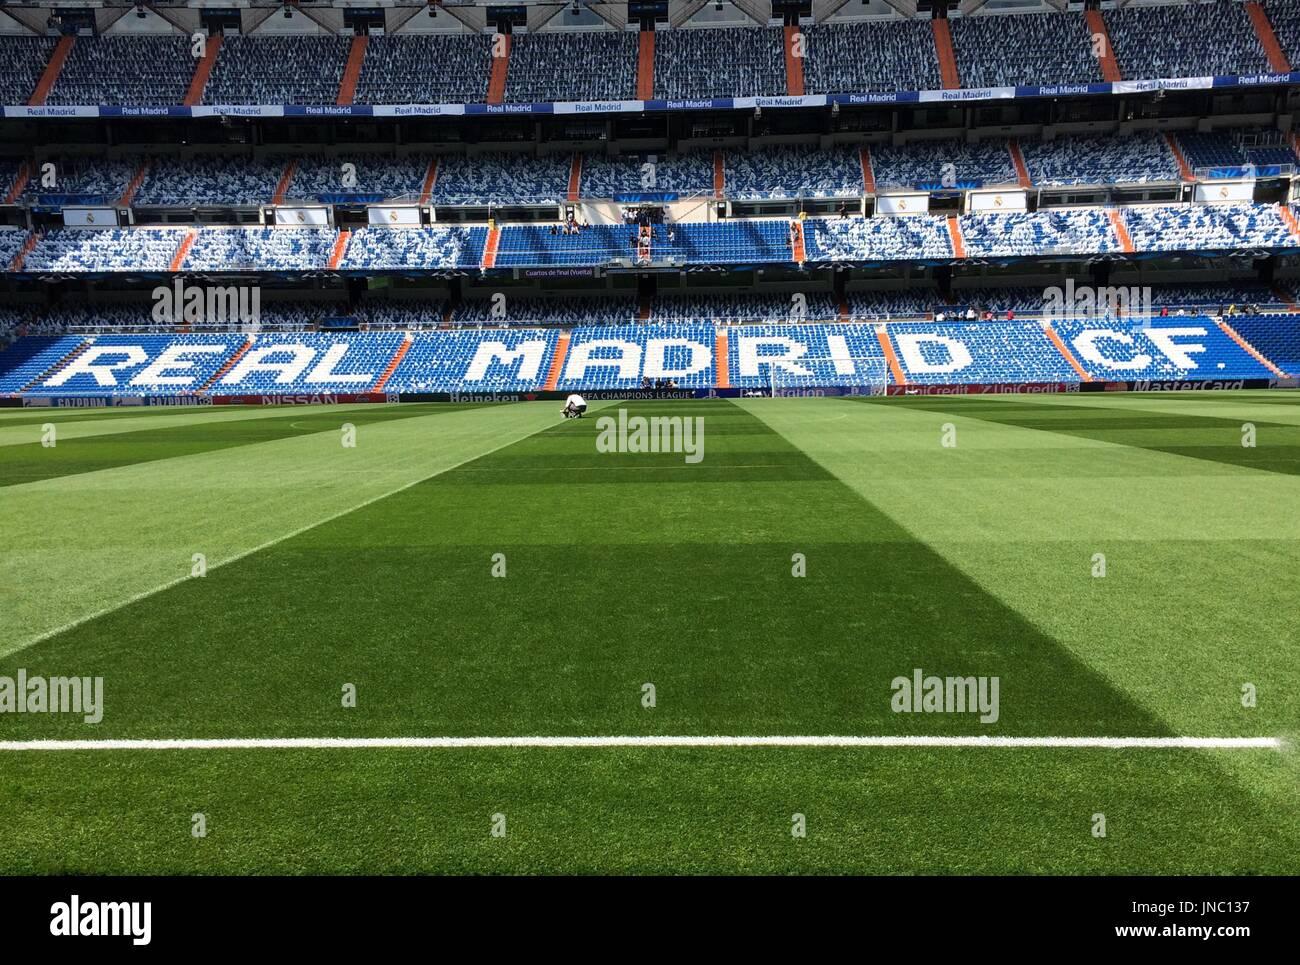 stadium - Stock Image